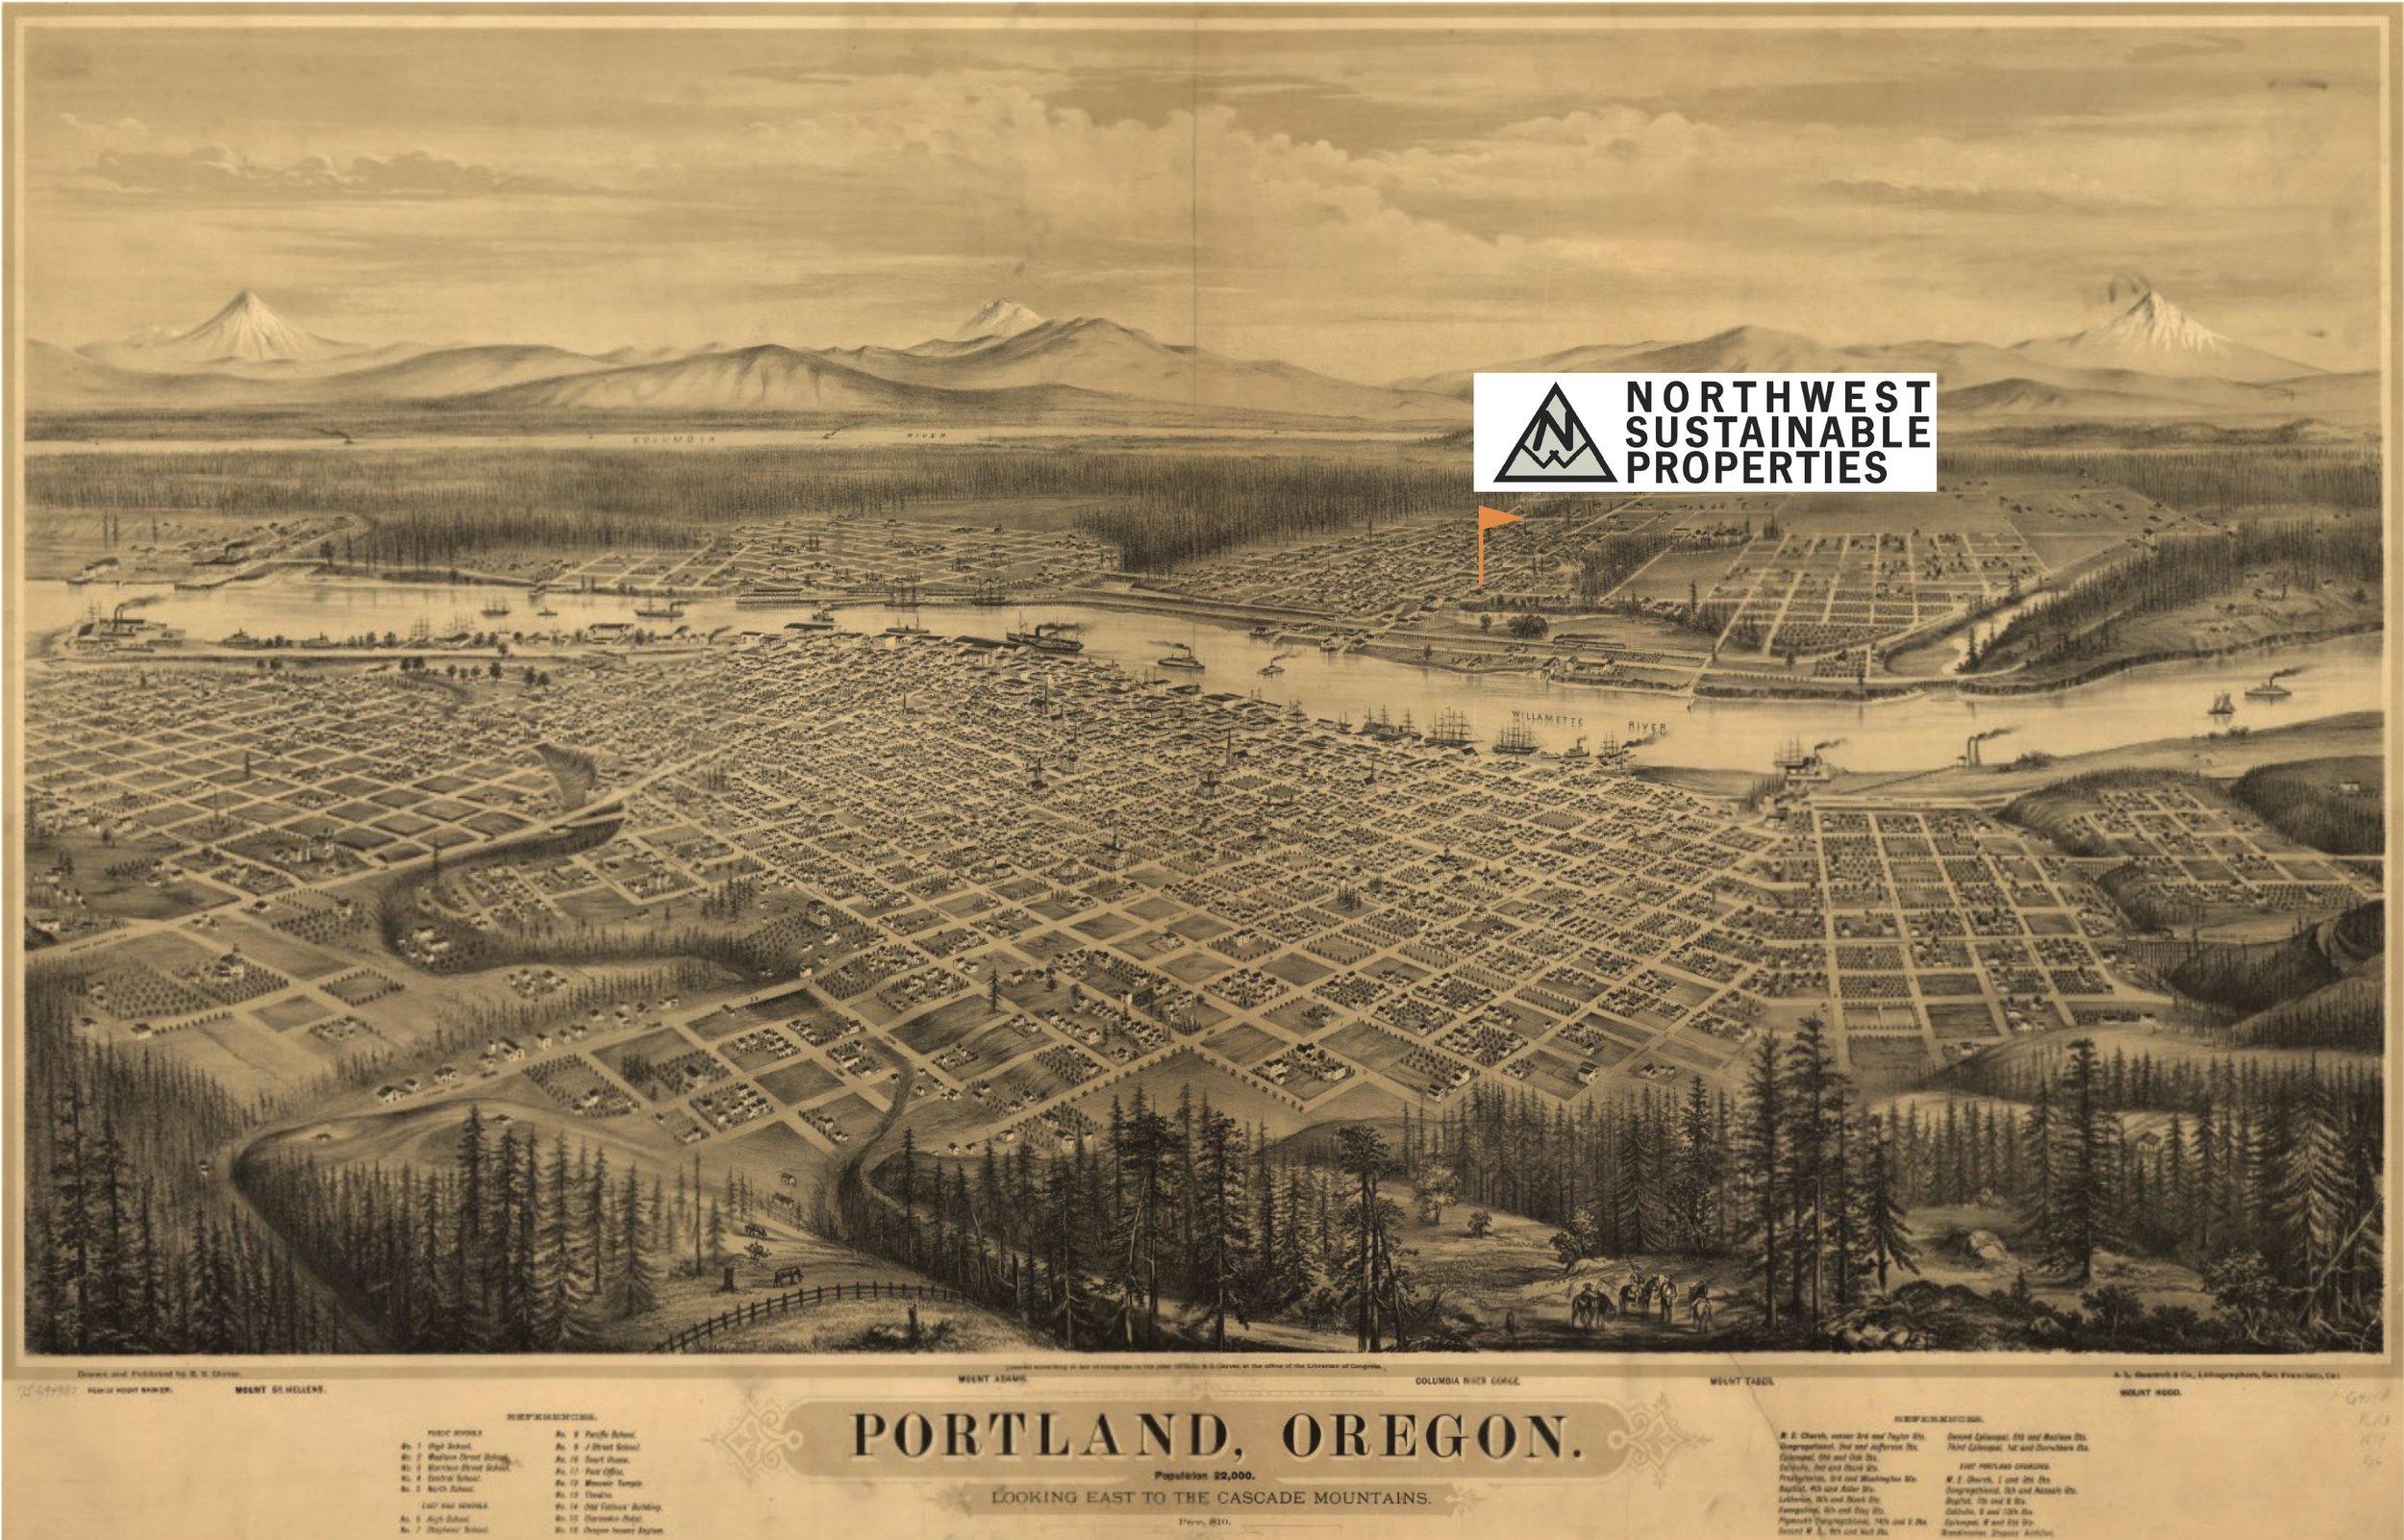 240 SE 2nd Portland, Oregon 97214